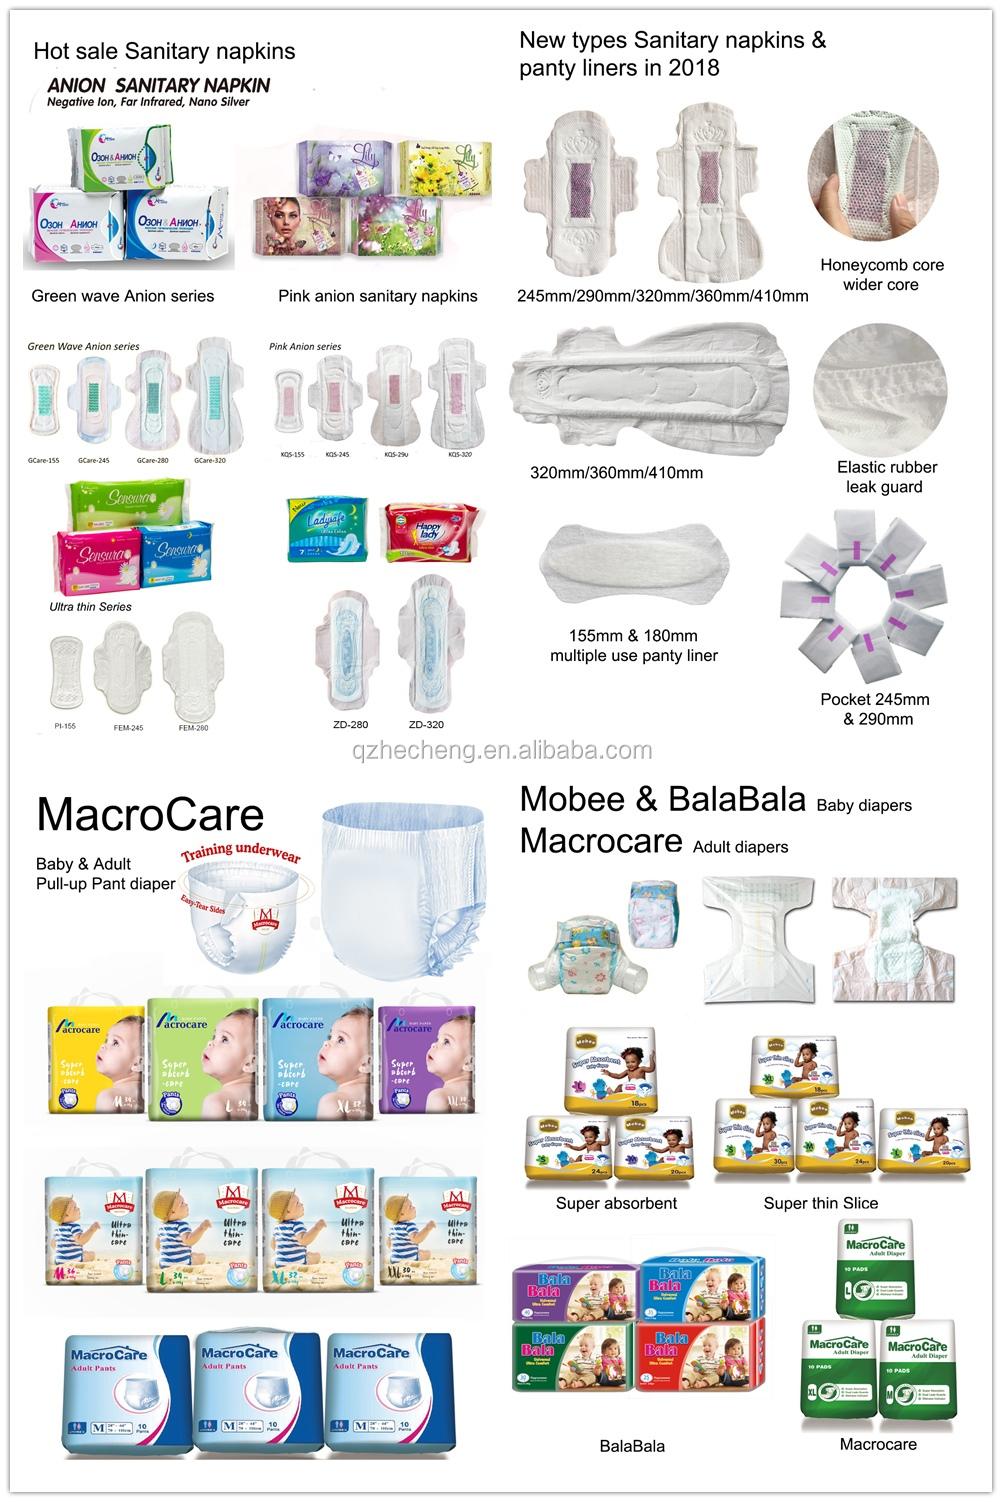 Macrocare de pañales desechables para bebés/pañales pantalón tipo